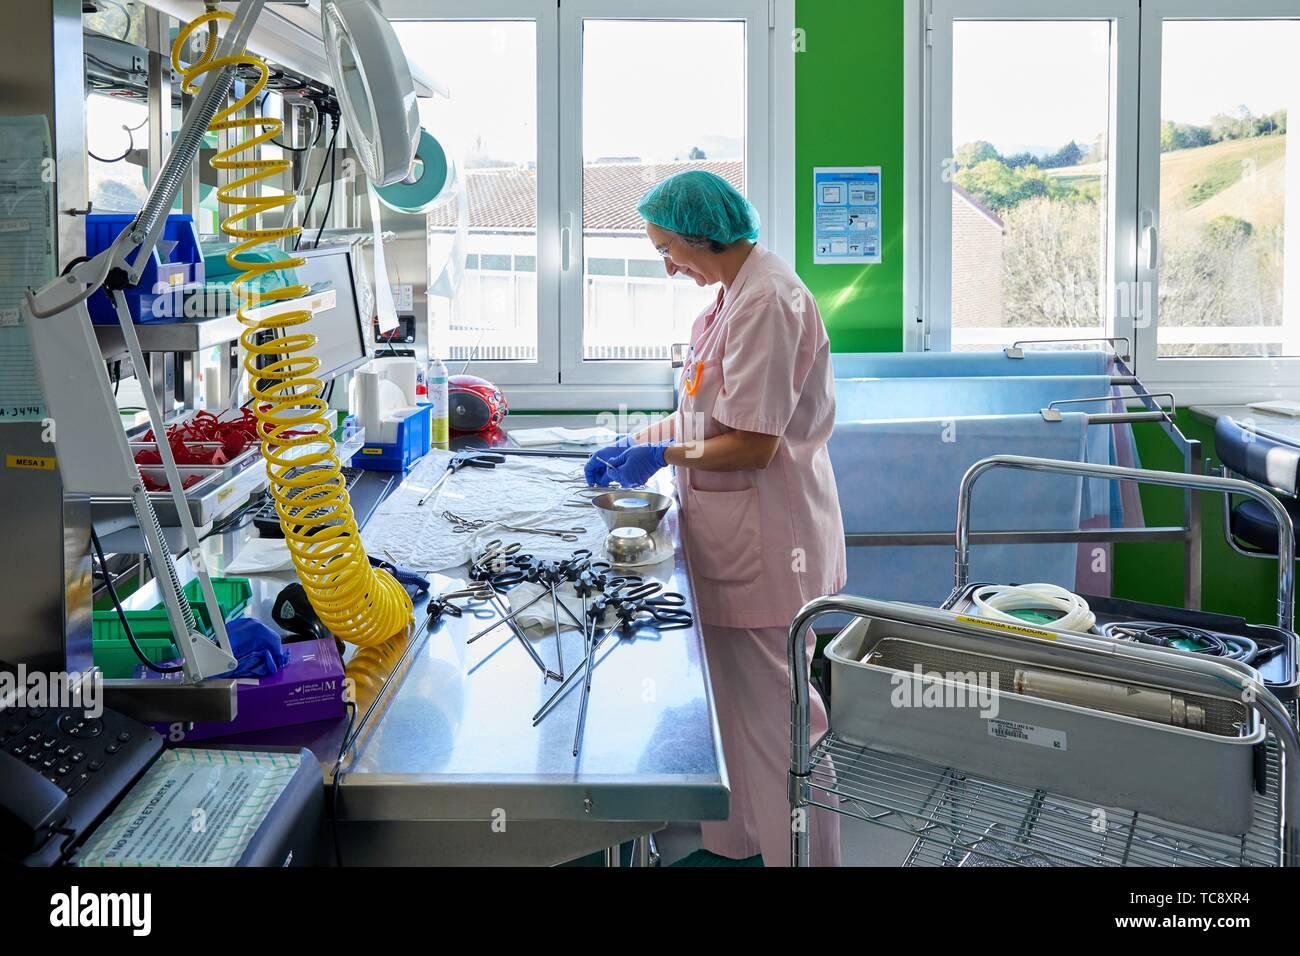 Chirurgisches Material, Sterilisation, Autoklav Reinigung, Krankenhaus Donostia, San Sebastian, Gipuzkoa, Baskenland, Spanien Stockbild